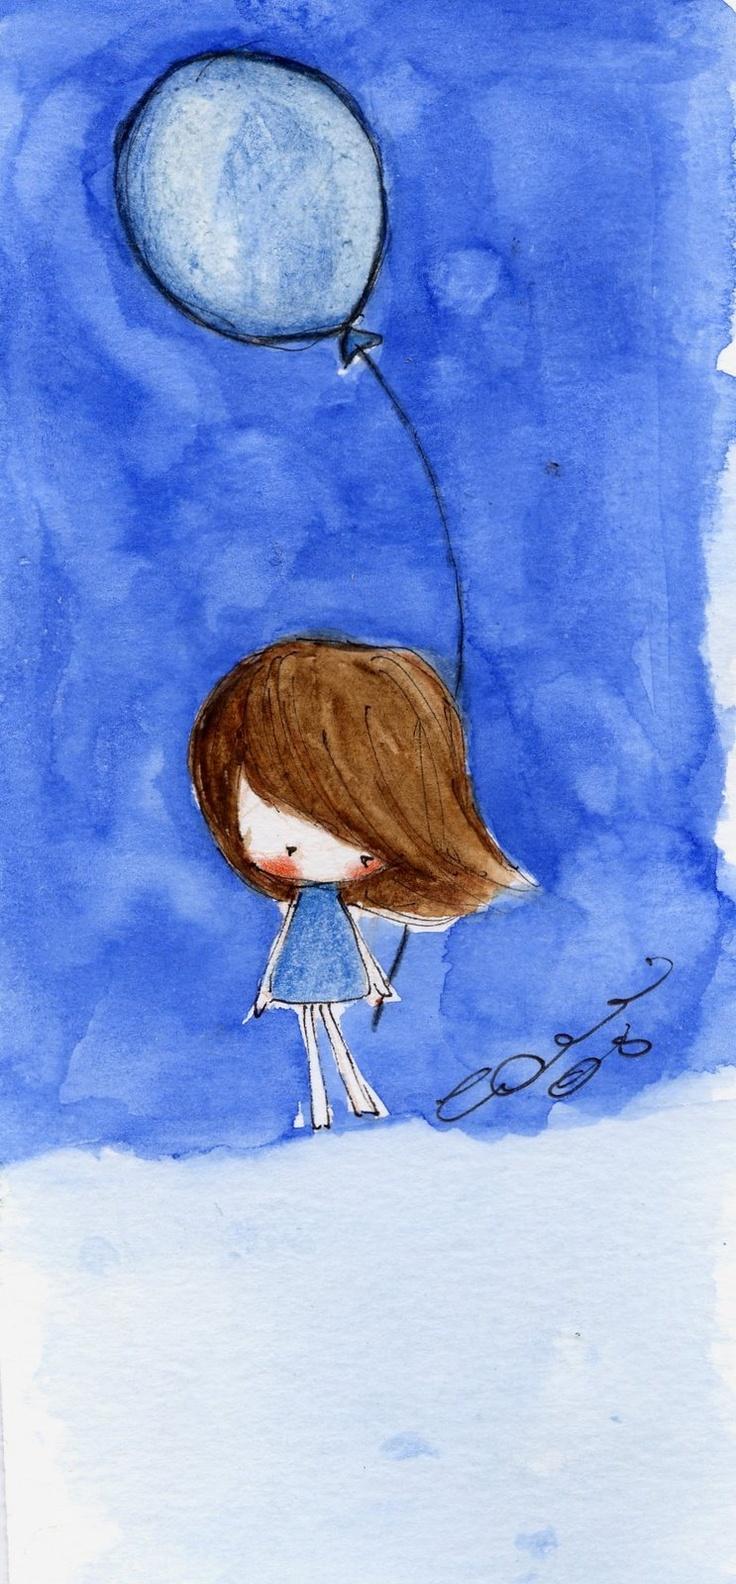 By Aris on Aris-blog